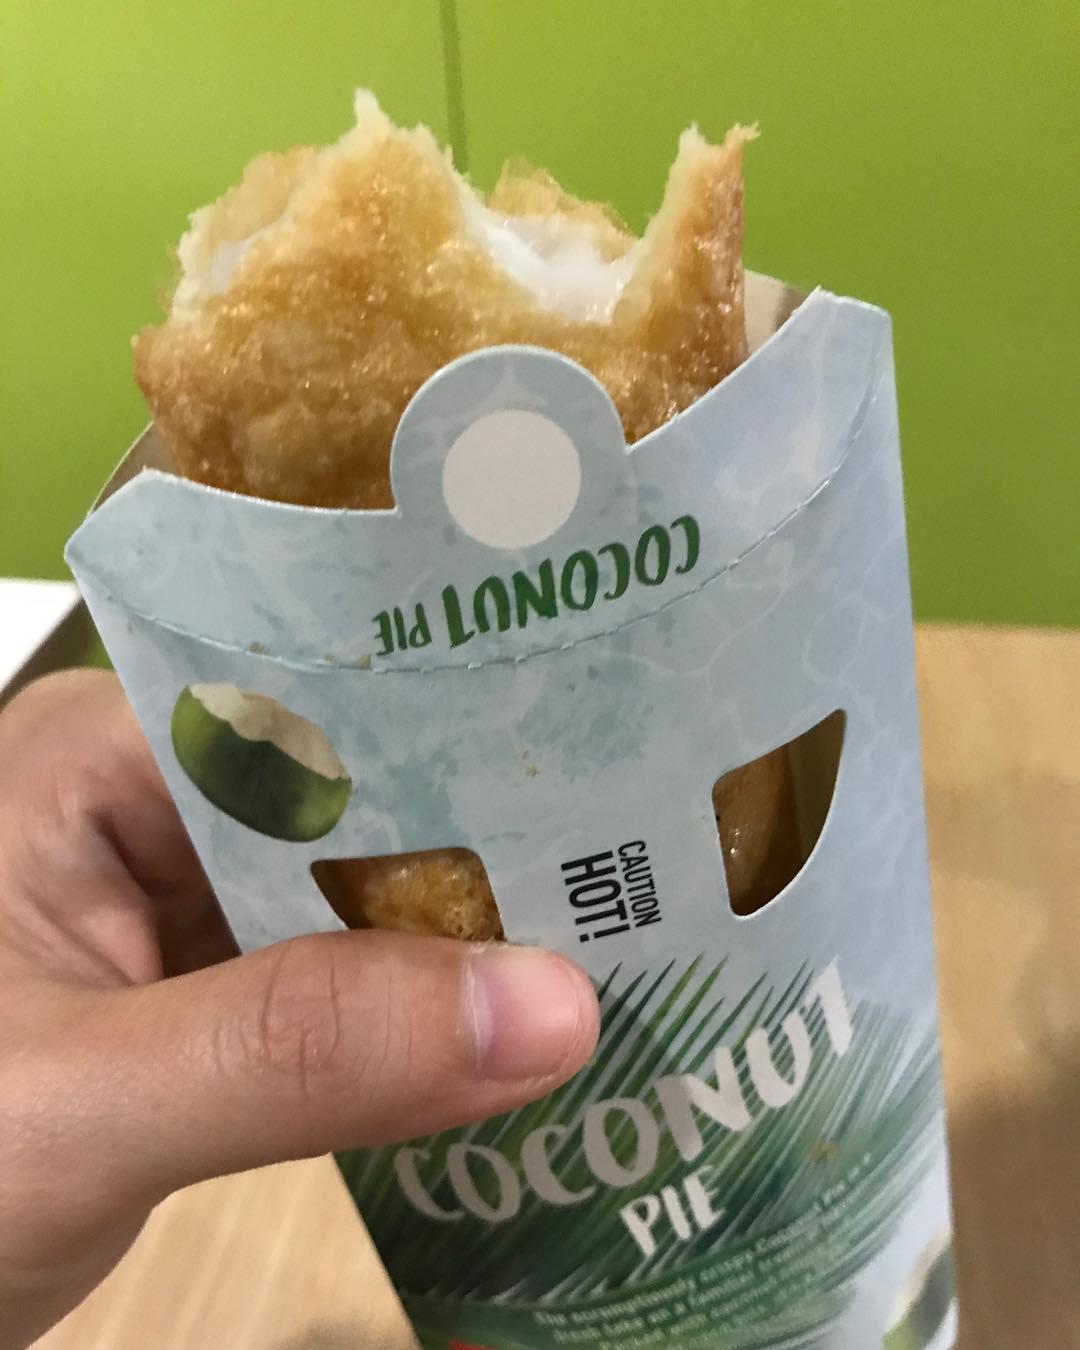 McDonald's Crispy Chicken - Coconut Pie